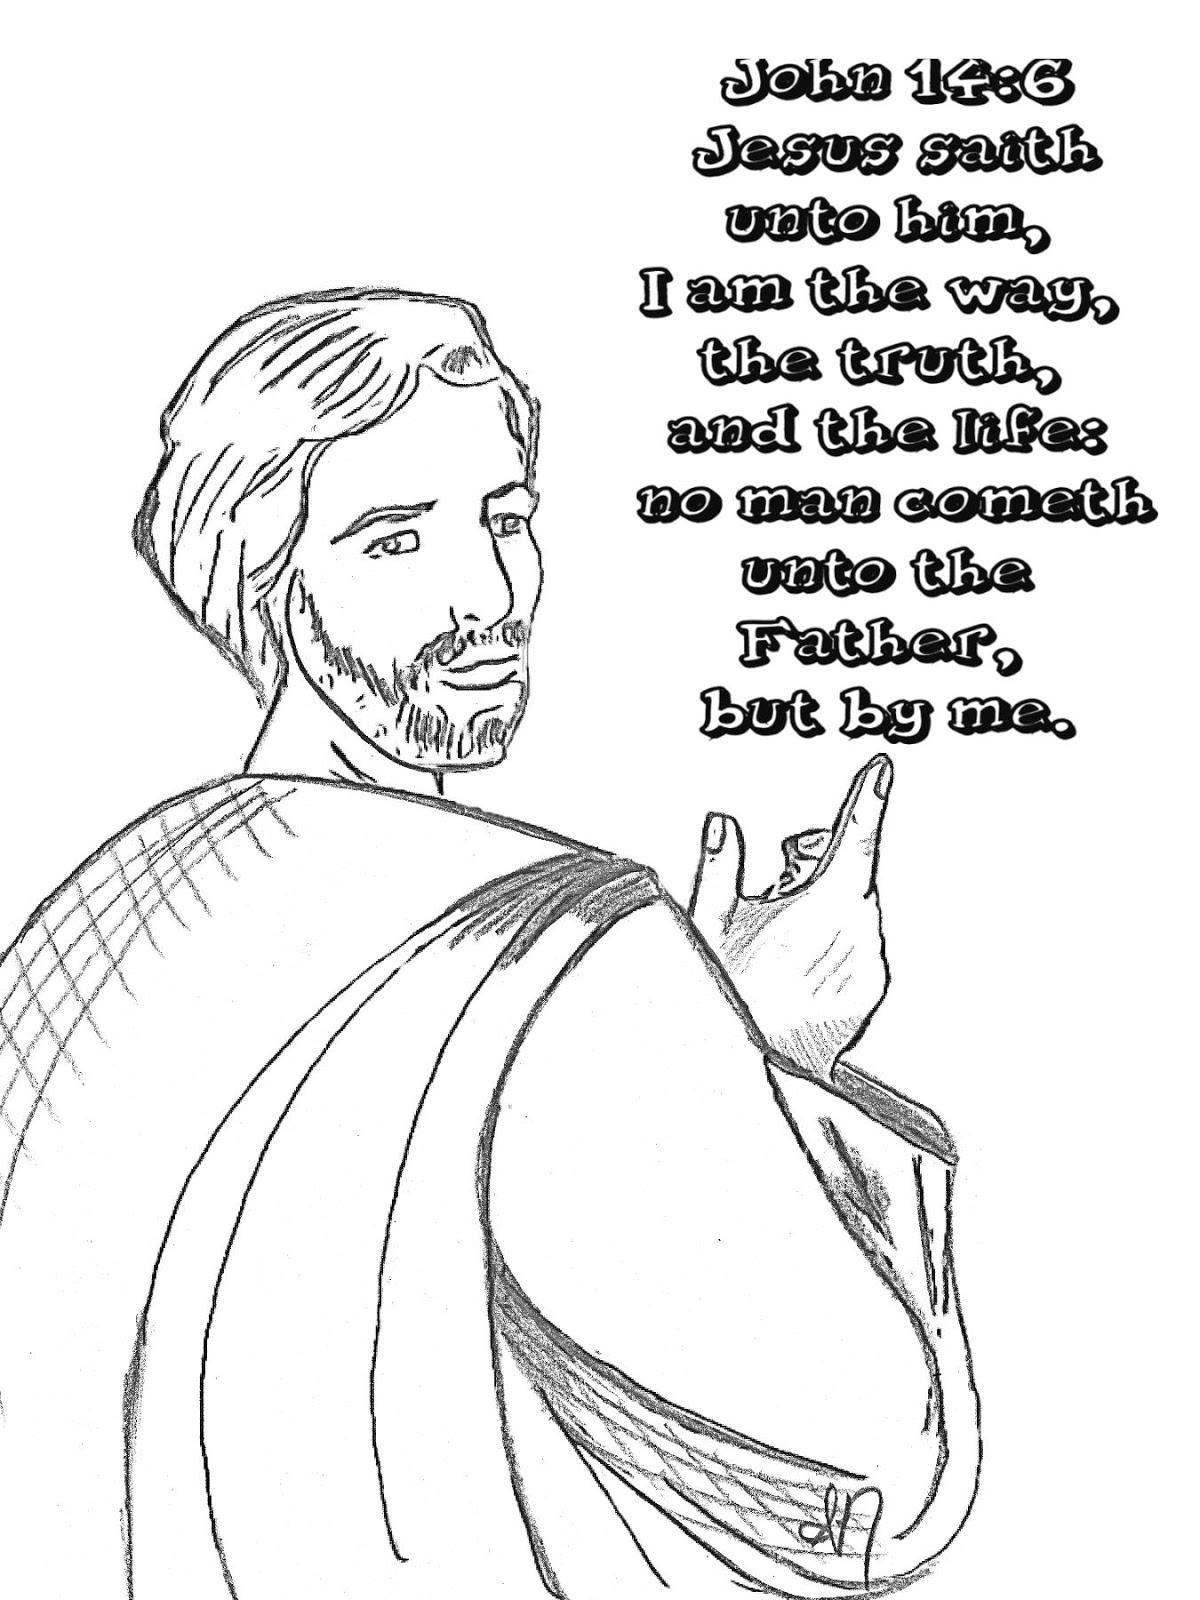 Children's Gems In My Treasure Box: John 14:6 Coloring Page